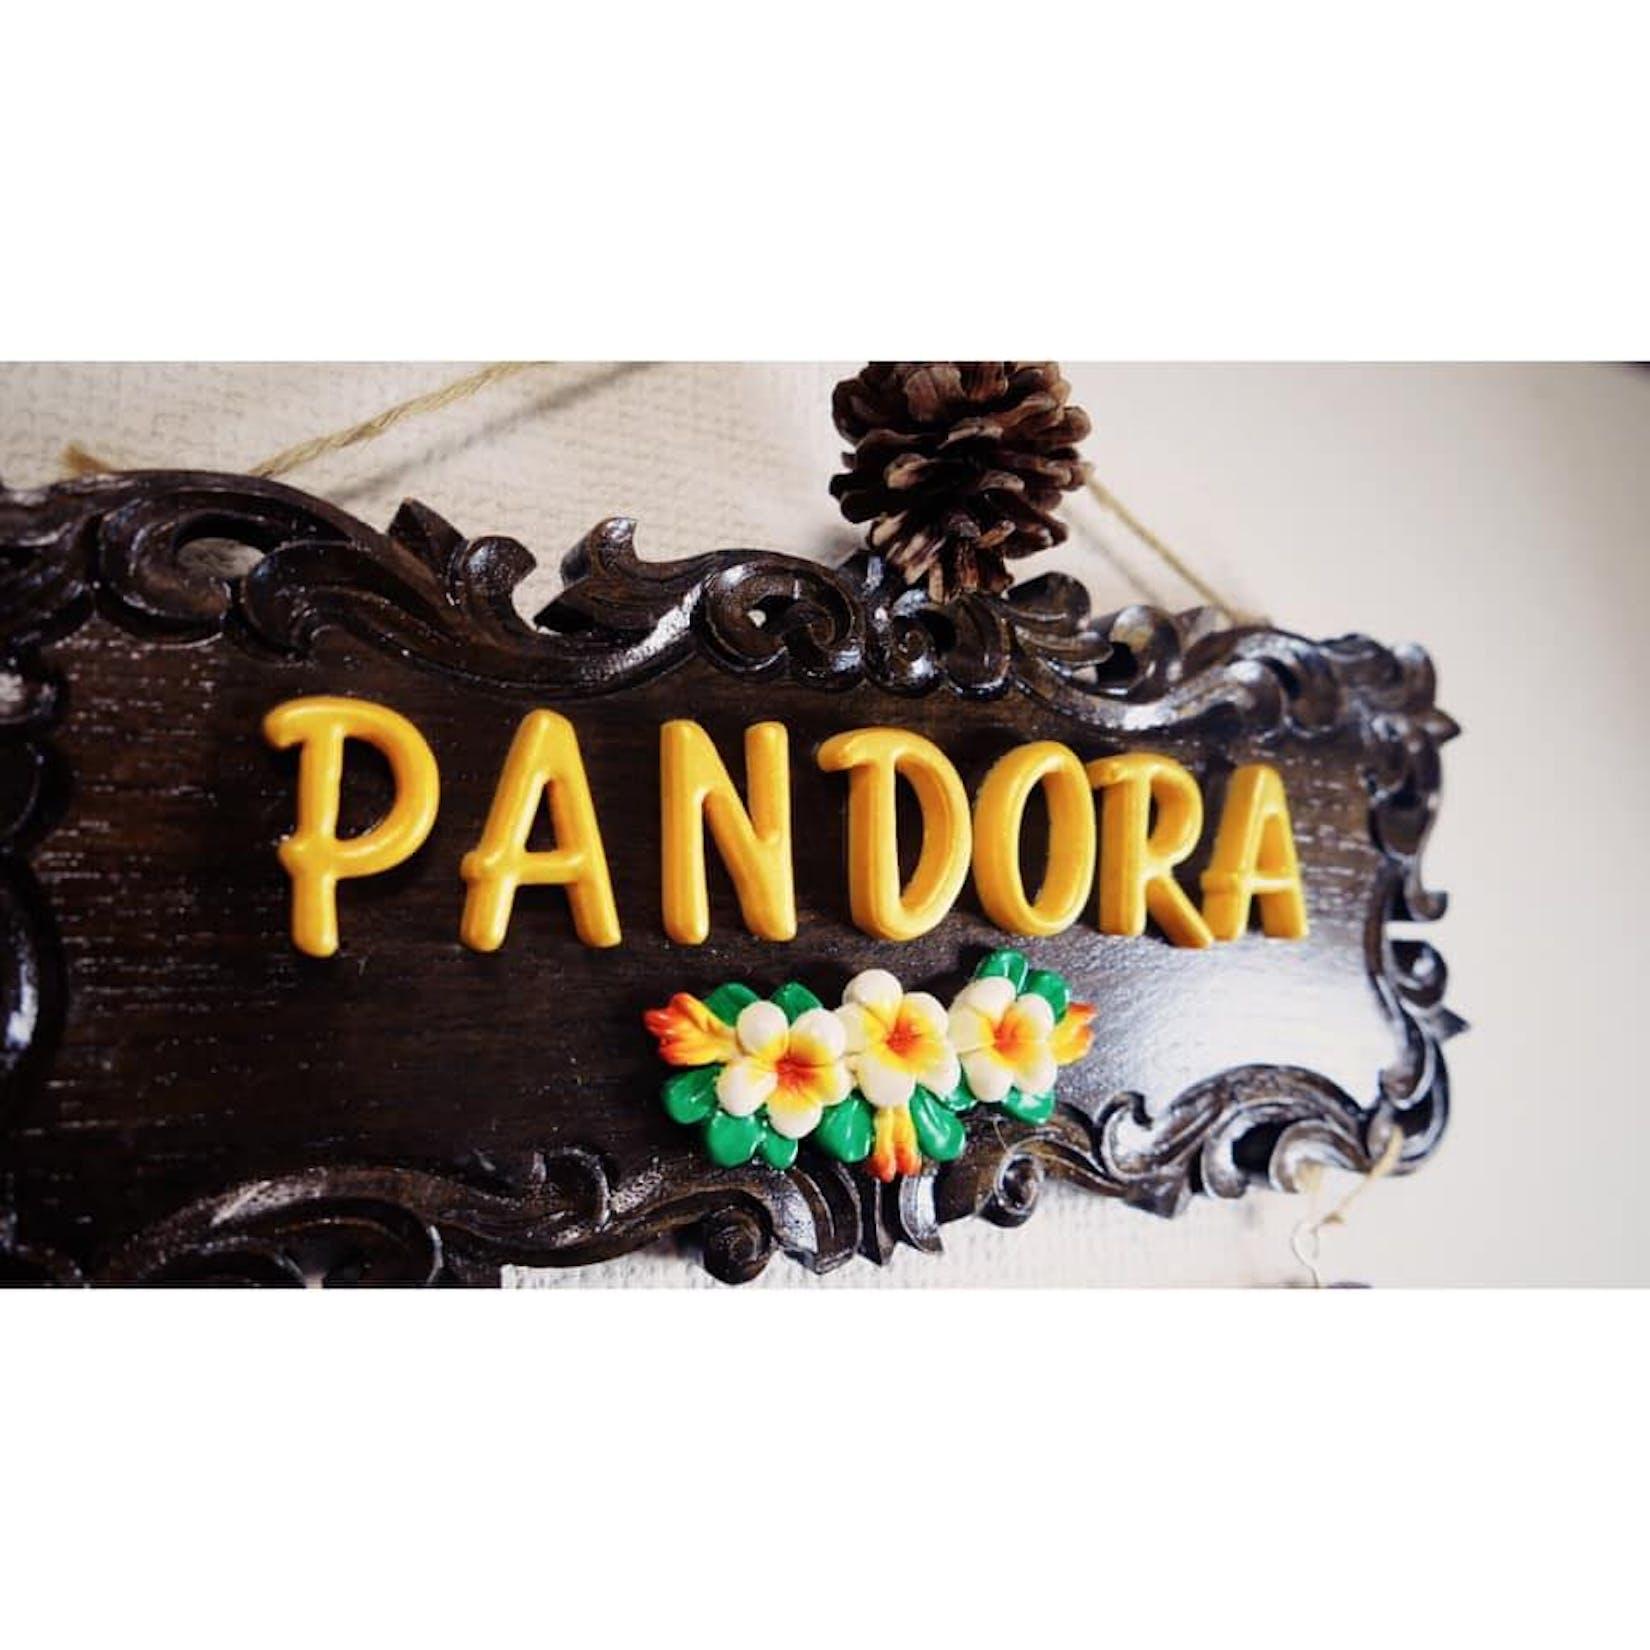 Pandora by Phyu - Skin Care & Eyebrow Training Academy | Beauty